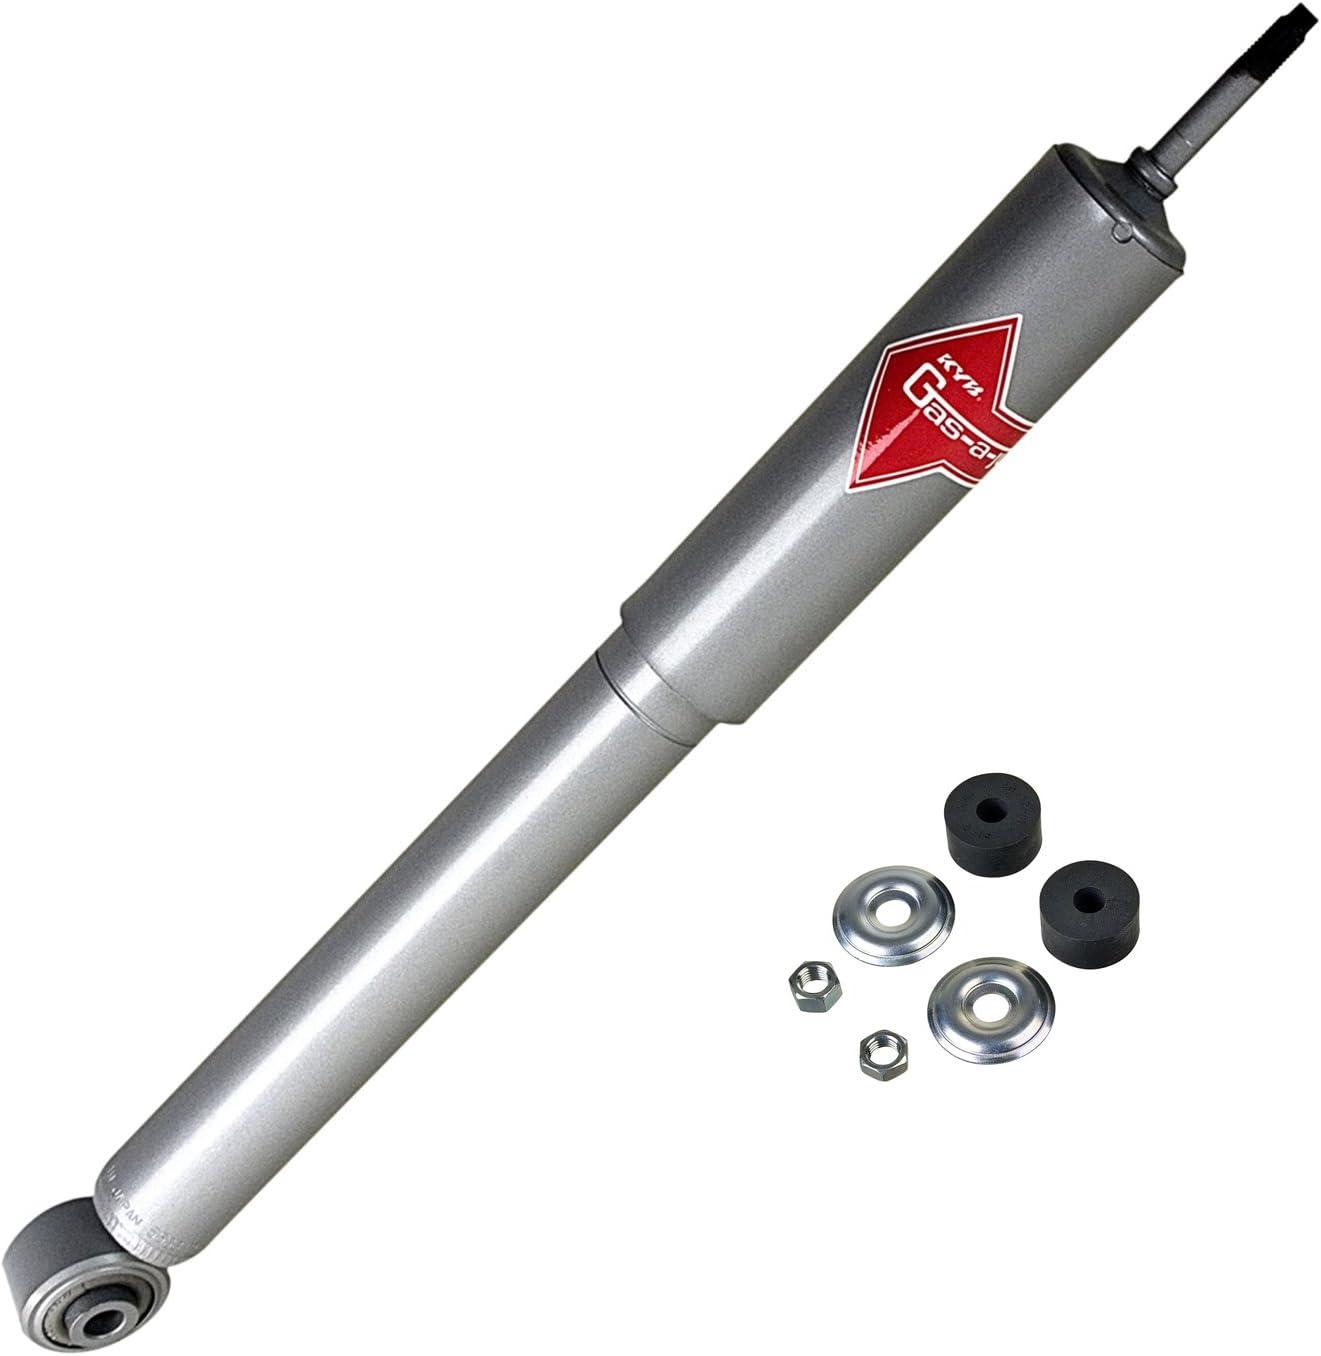 WINGONEER 165Pcs Zinc Plated Carbon Steel Rivet Nut Insert Nutsert M3 M4 M5 M6 M8 M10 M12